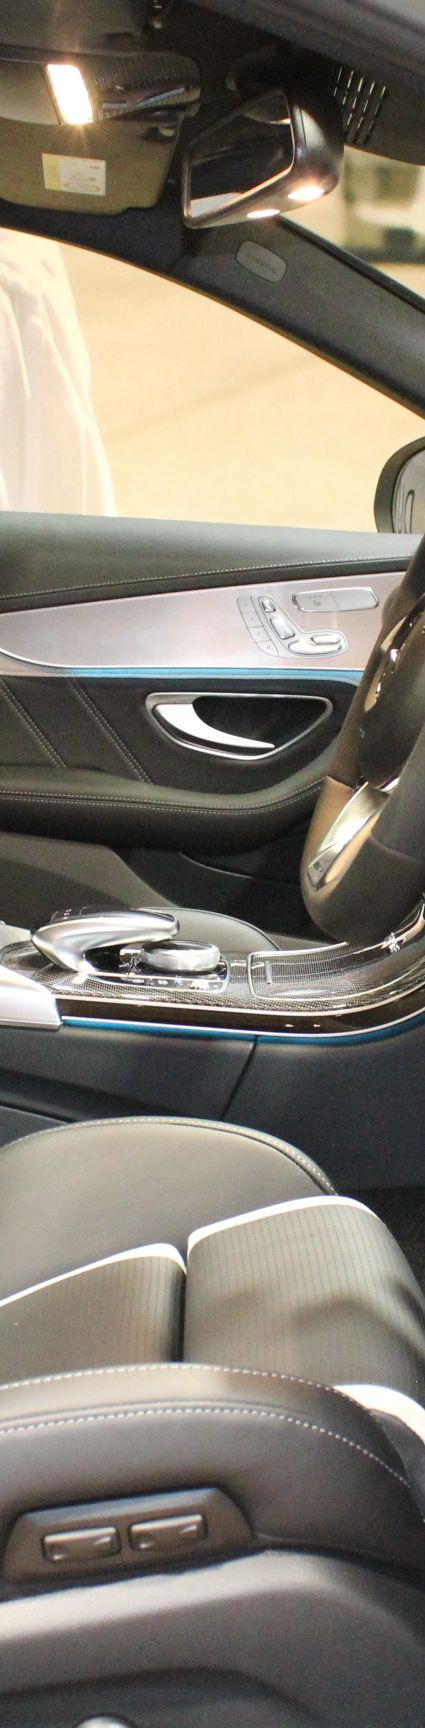 2015 Mercedes-Benz C63 W205 AMG S Sedan 4dr SPEEDSHIFT MCT 7sp 4.0TT - 15C63SSLVR - for sale in Australia